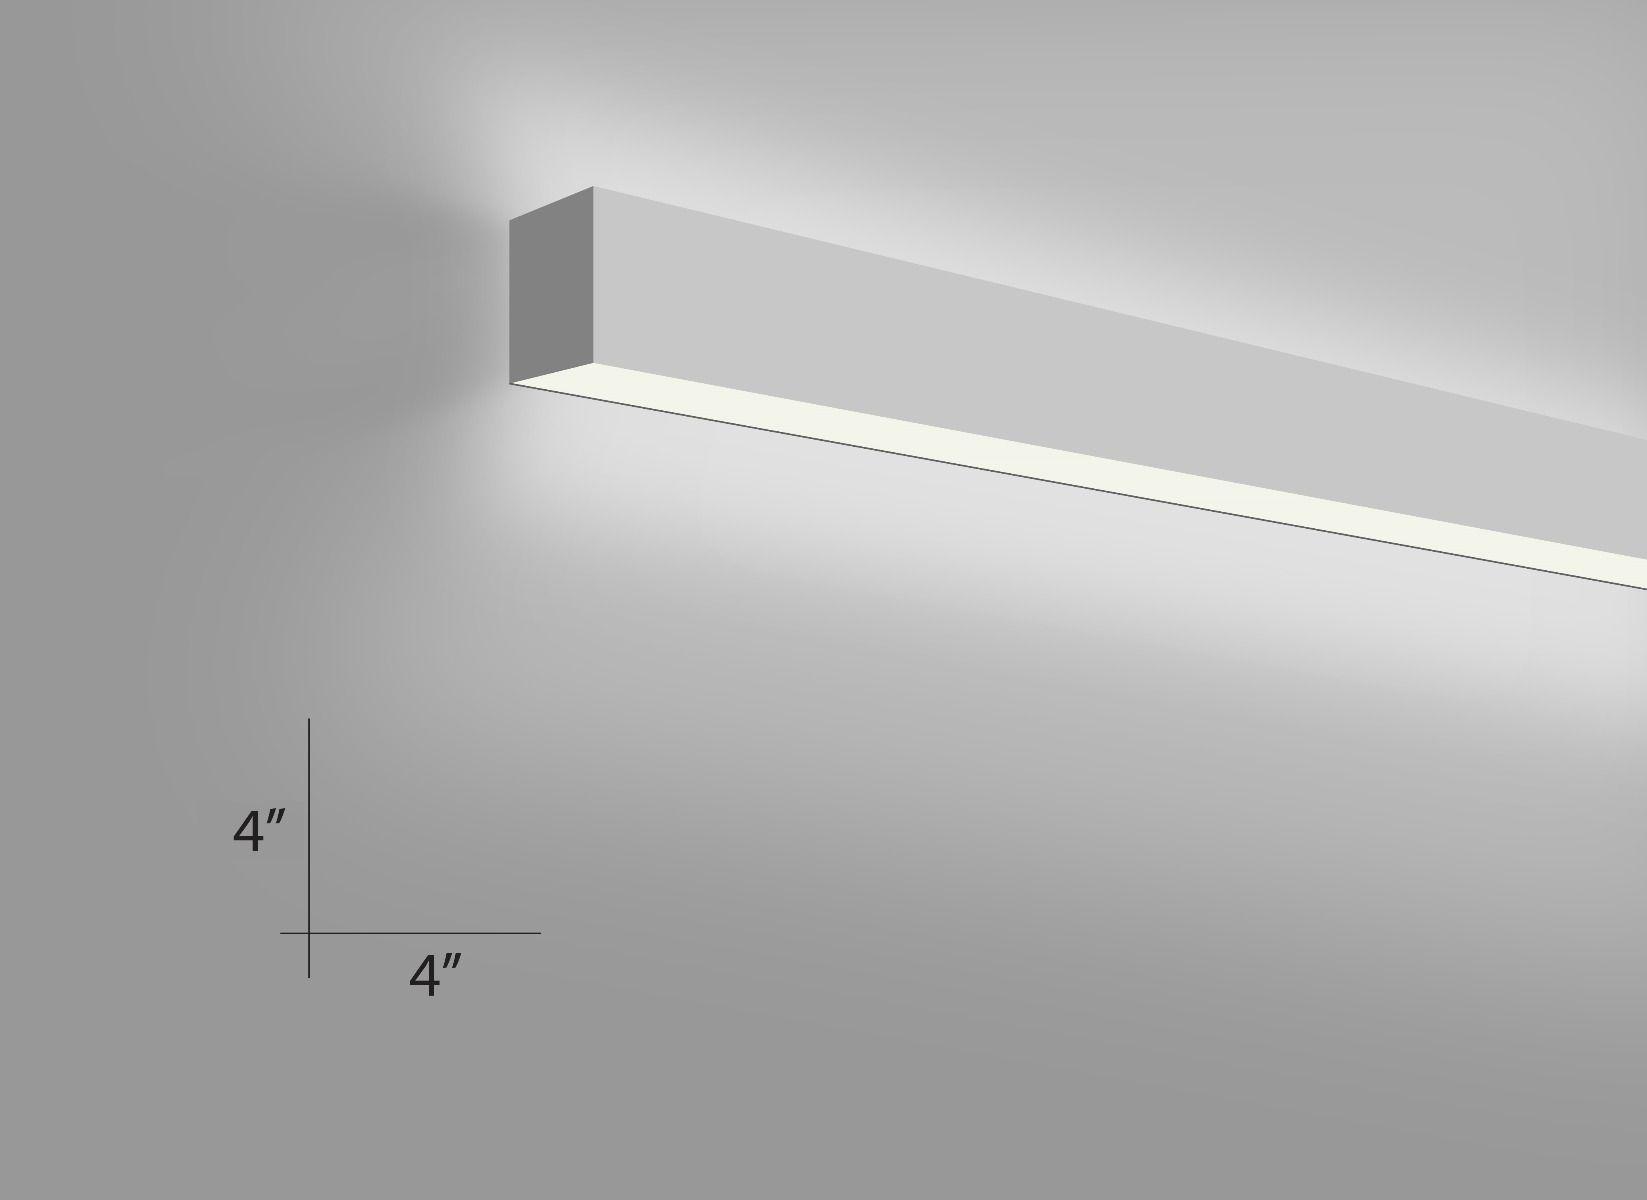 alcon lighting 12100 45 w continuum 45 series Multiple Fluorescent Light Wiring Diagram